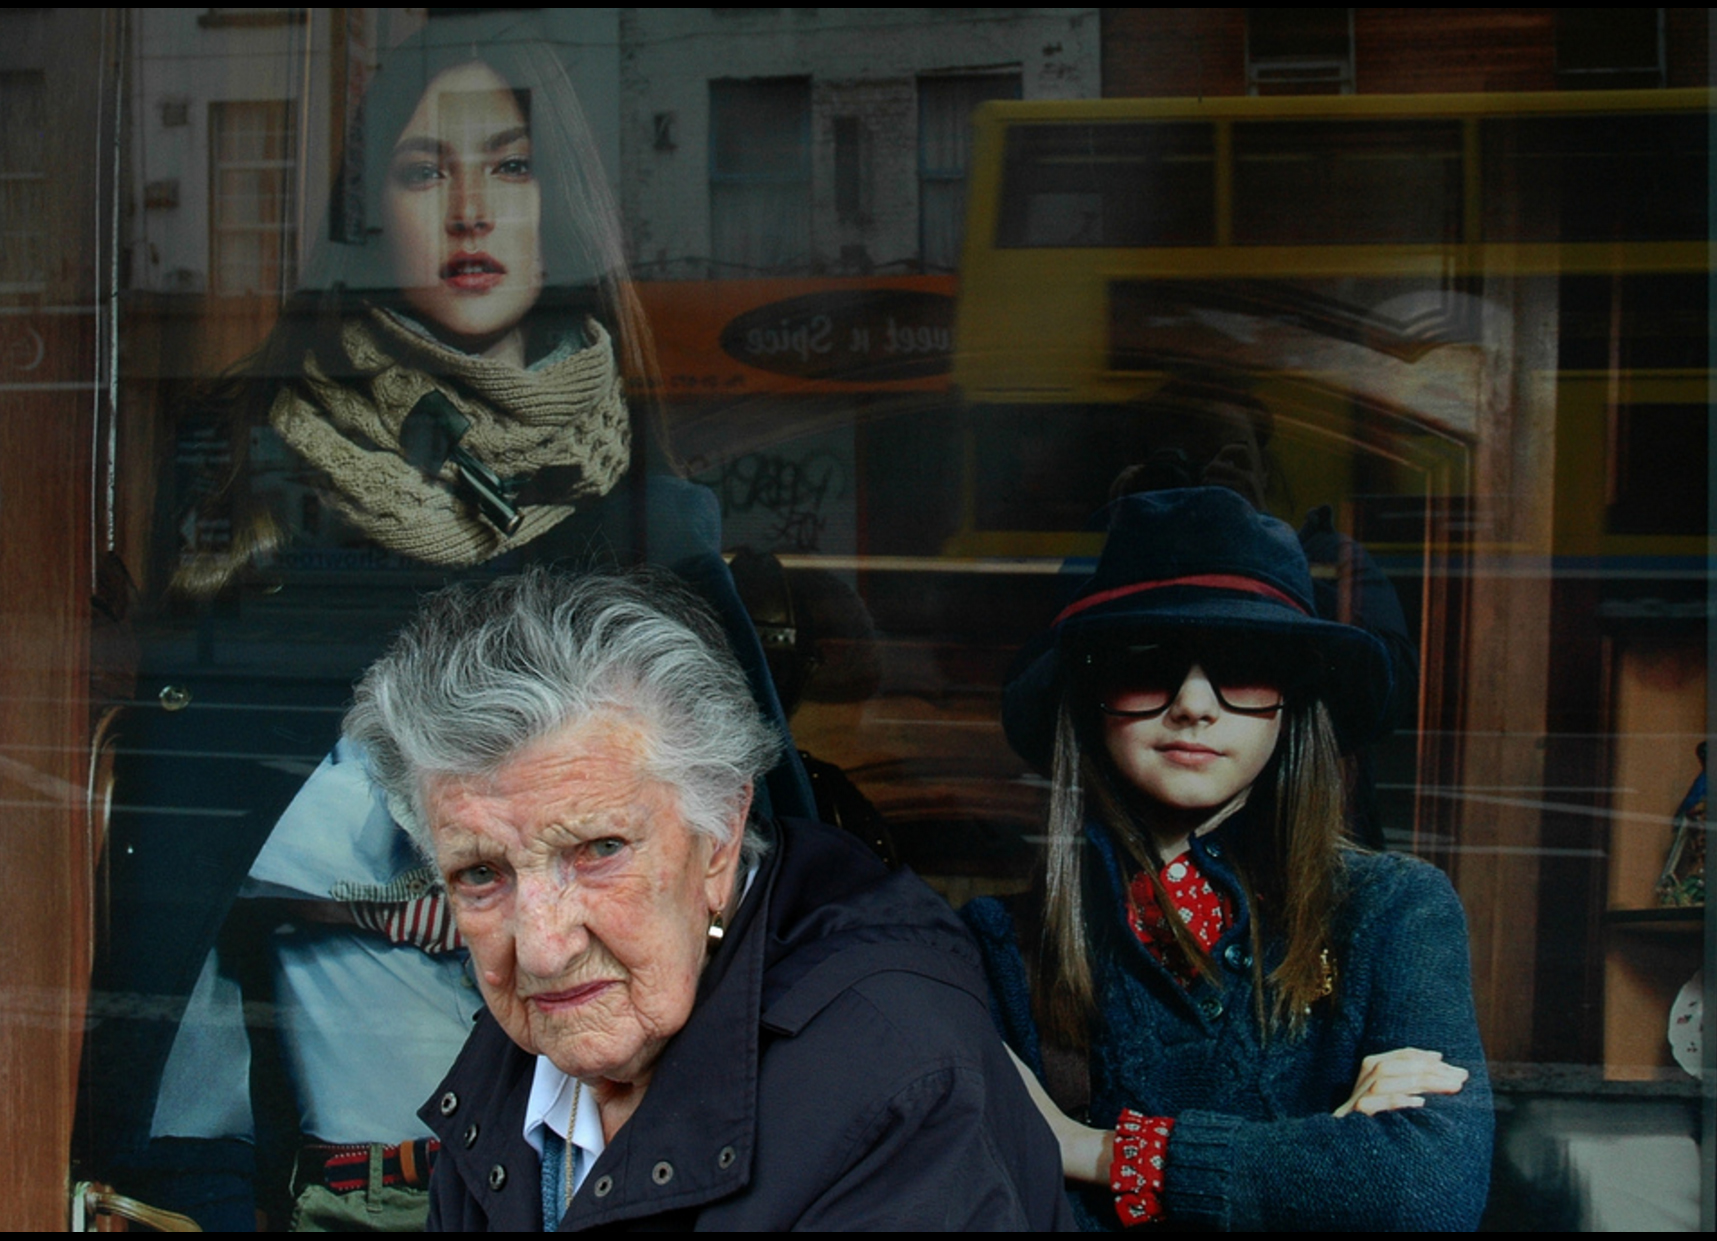 Dublin, 2011 (Danielle Houghton/GroundTruth)